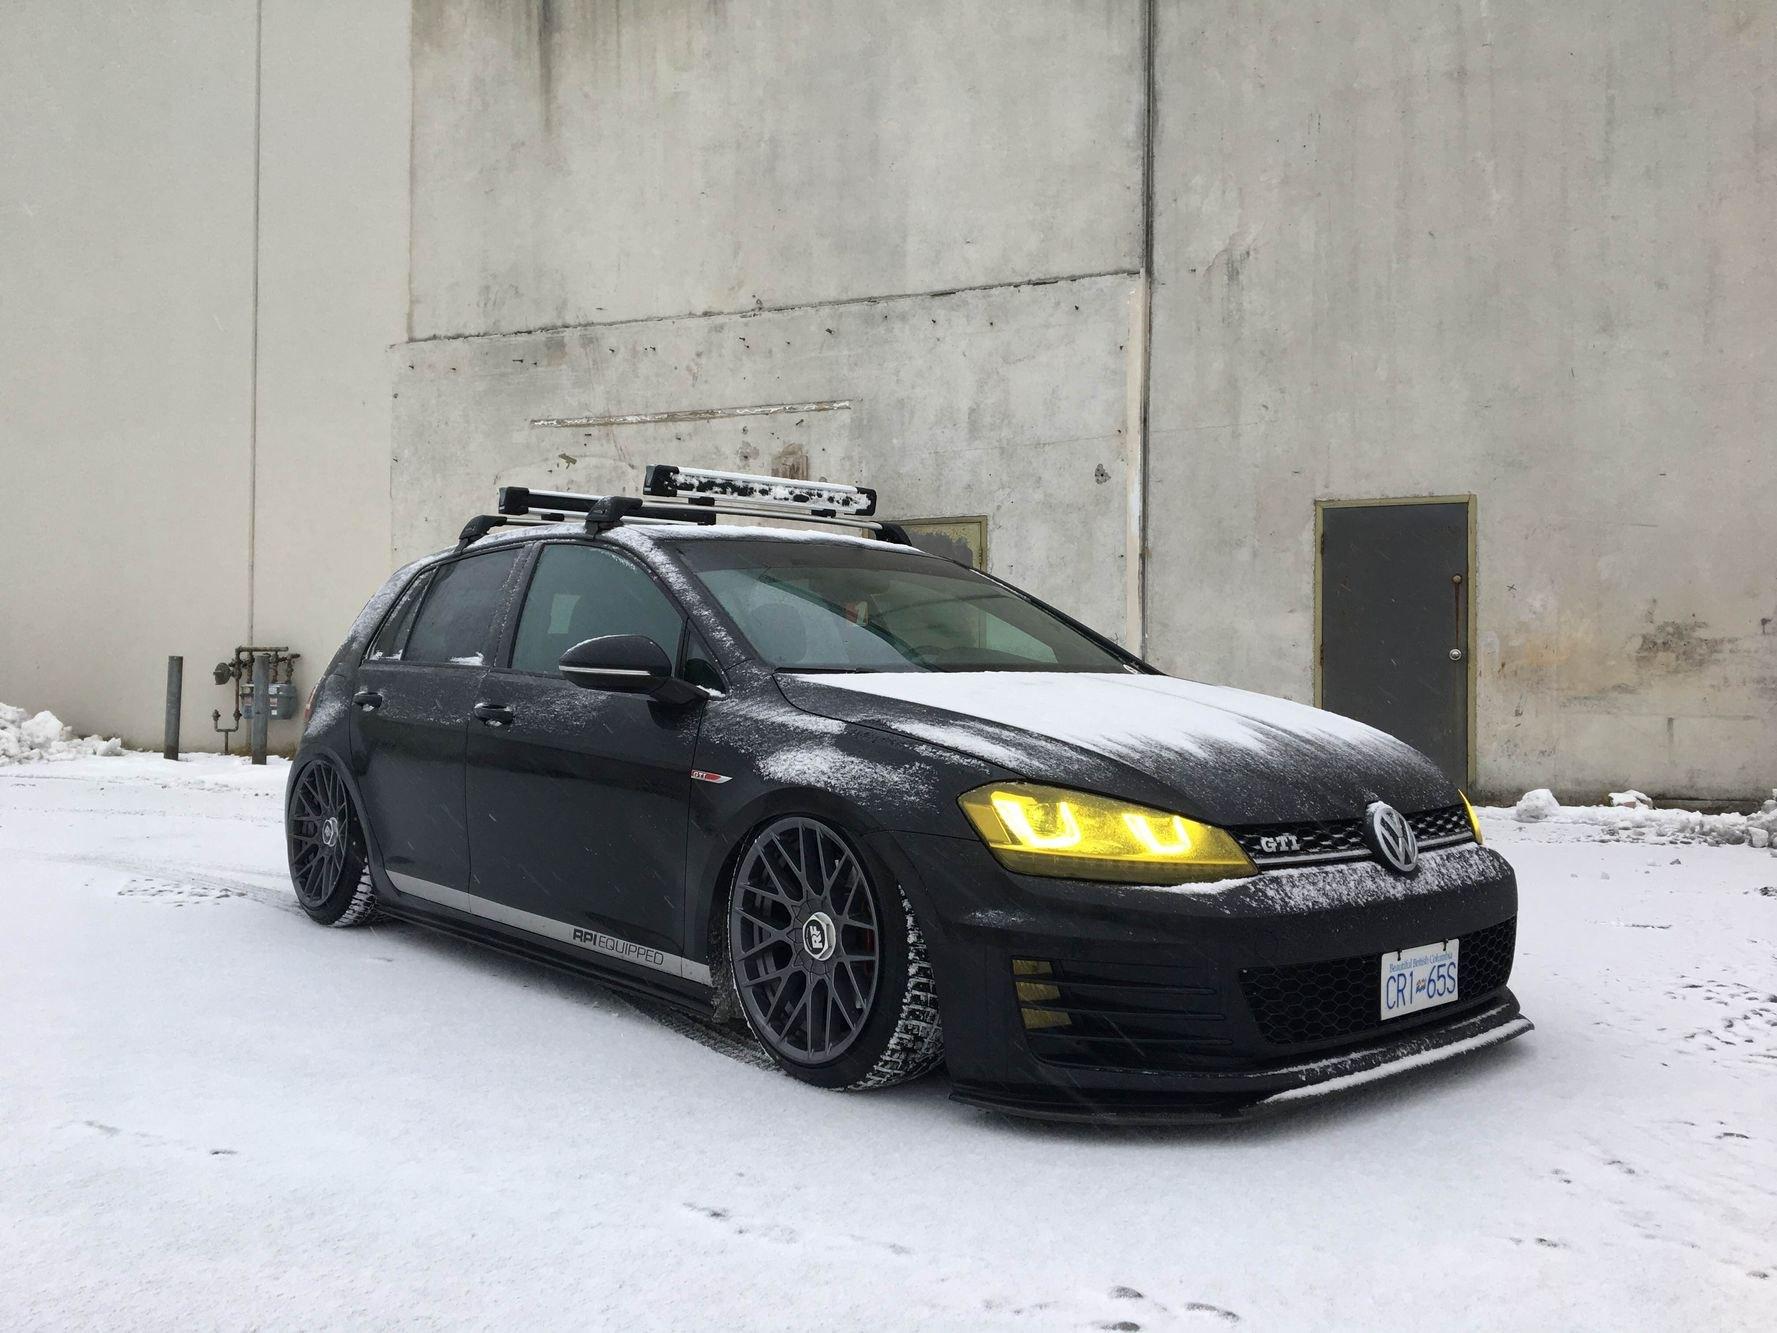 Custom 2018 Volkswagen Golf Gti Images Mods Photos Upgrades Carid Com Gallery